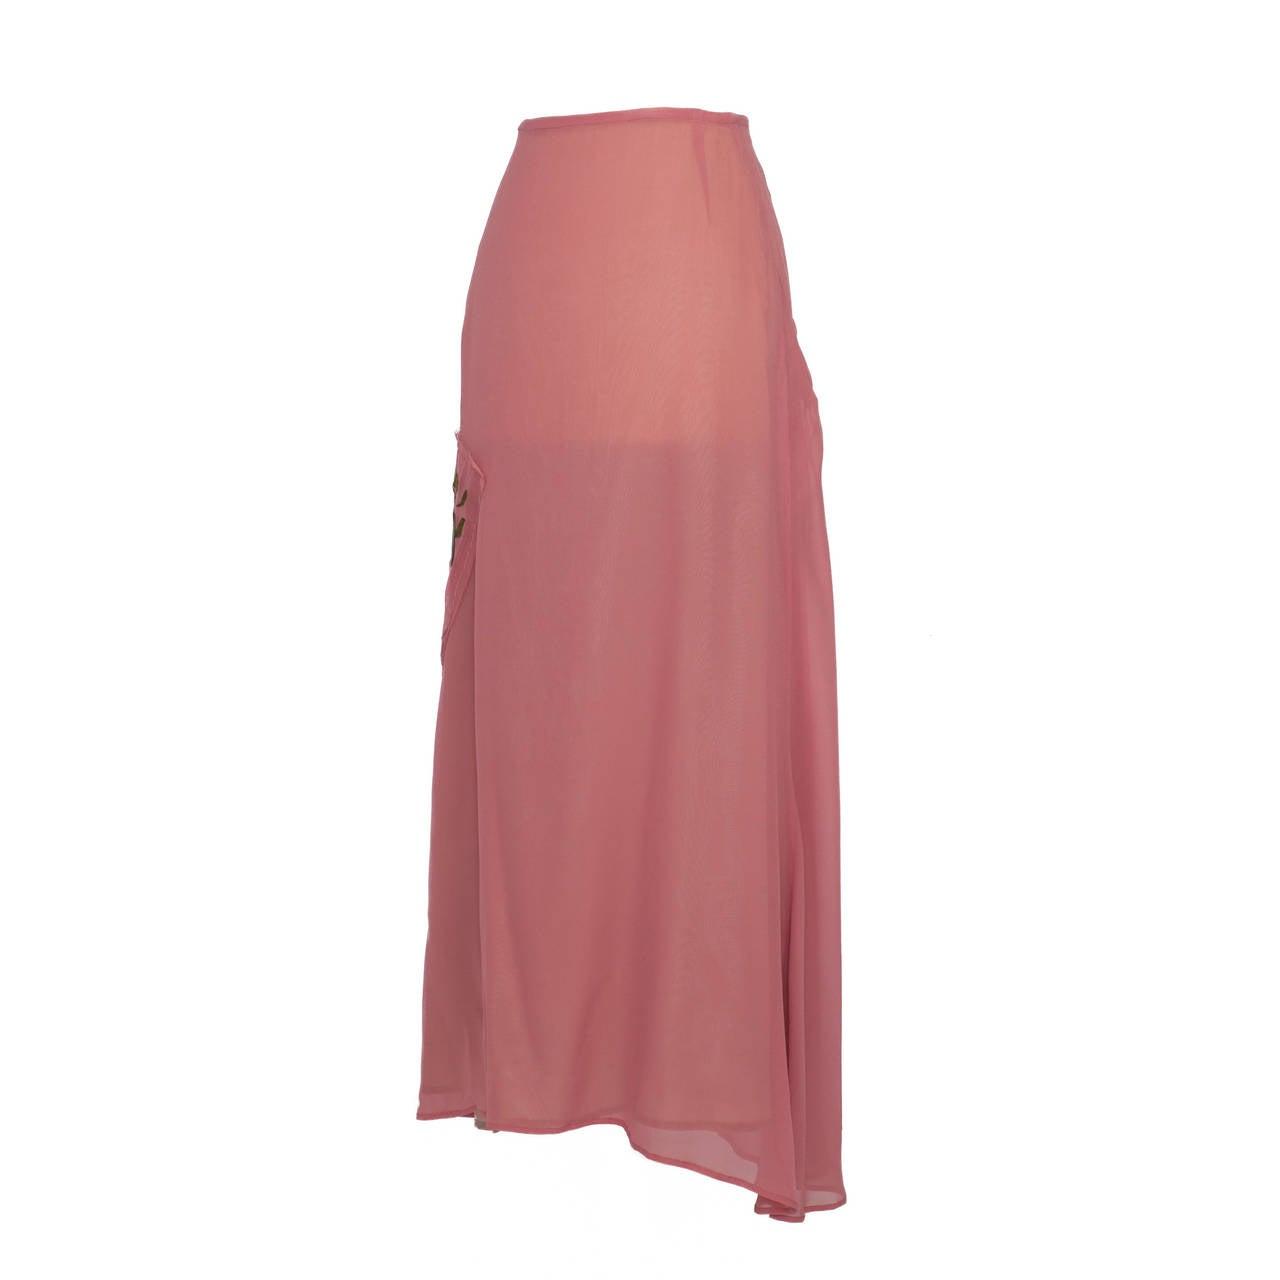 Yohji Yamamoto + Noir Pink Skirt Flower Embroidery For Sale 3